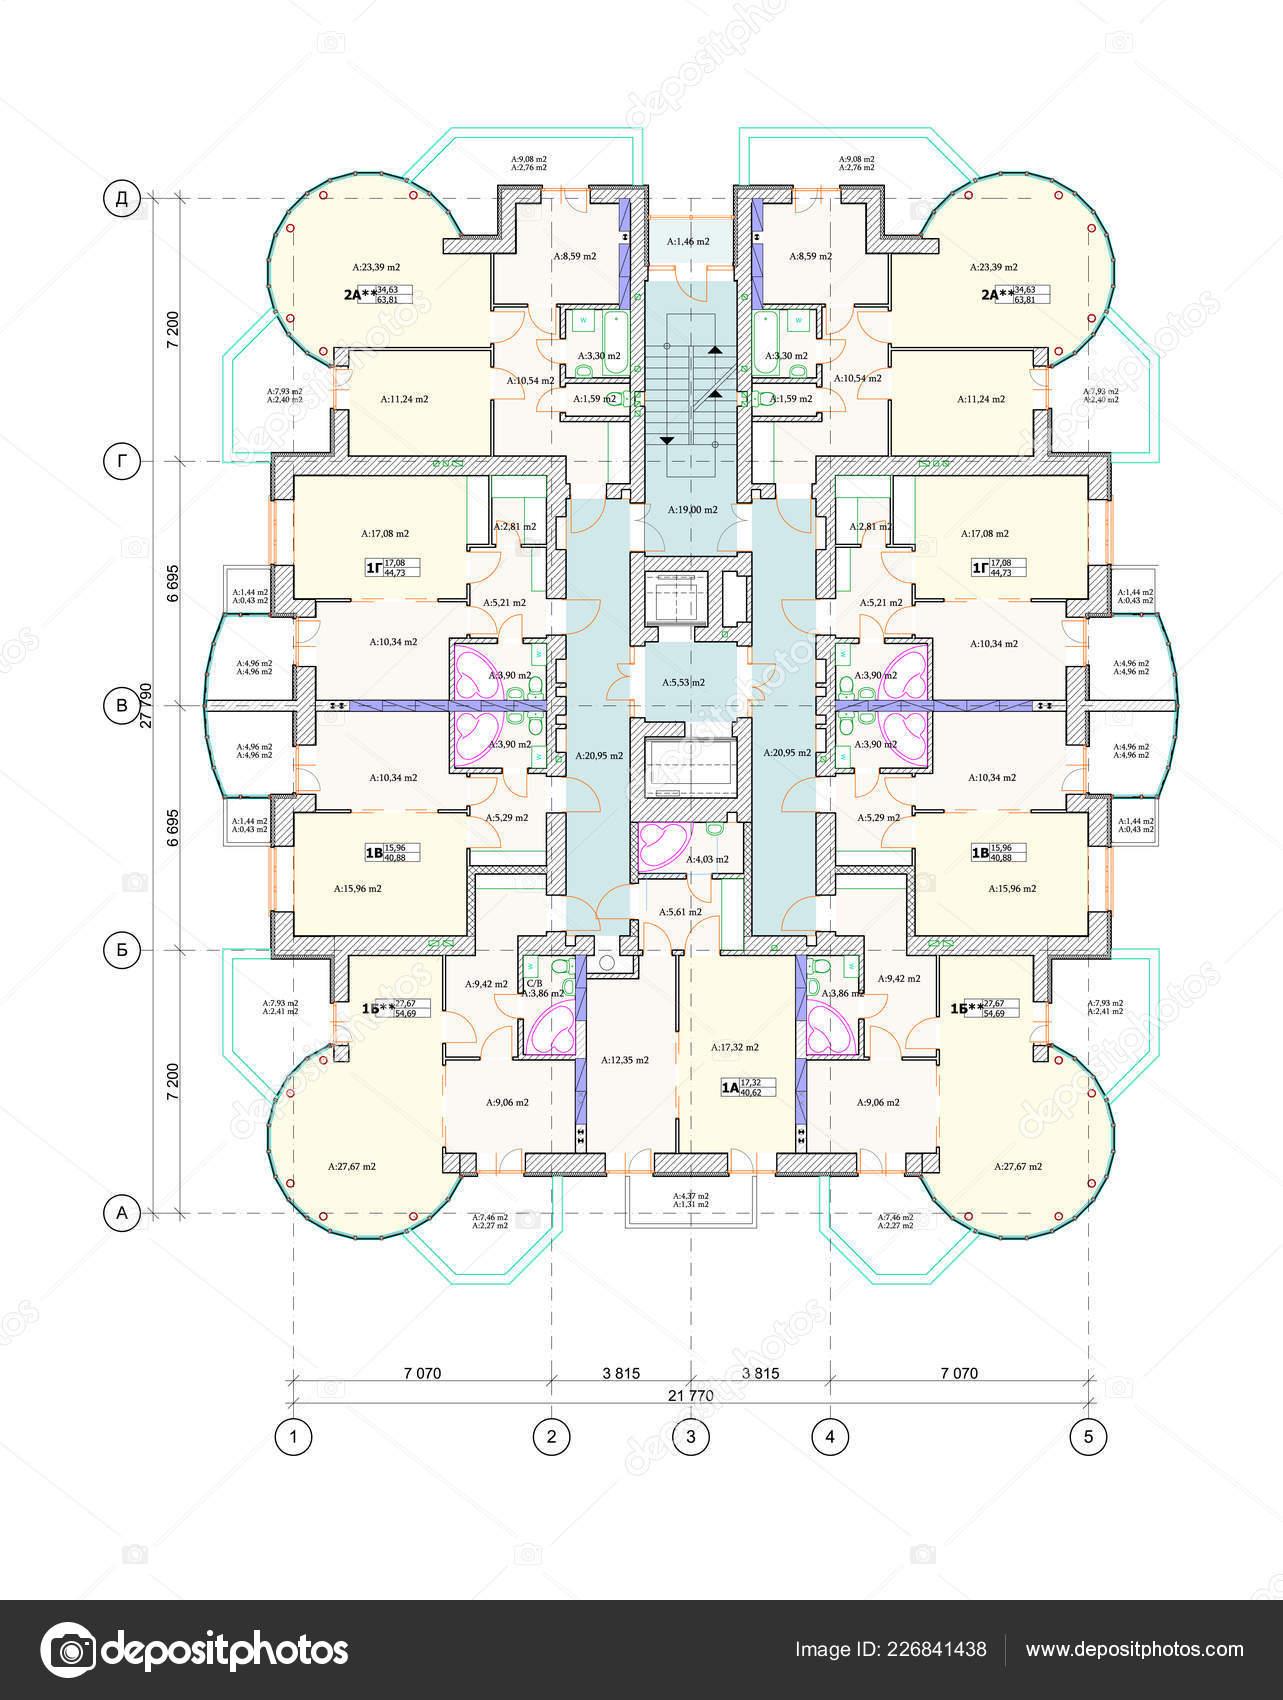 Vicepodlazni Budovy Pudorys Layout Detailni Architektonicke